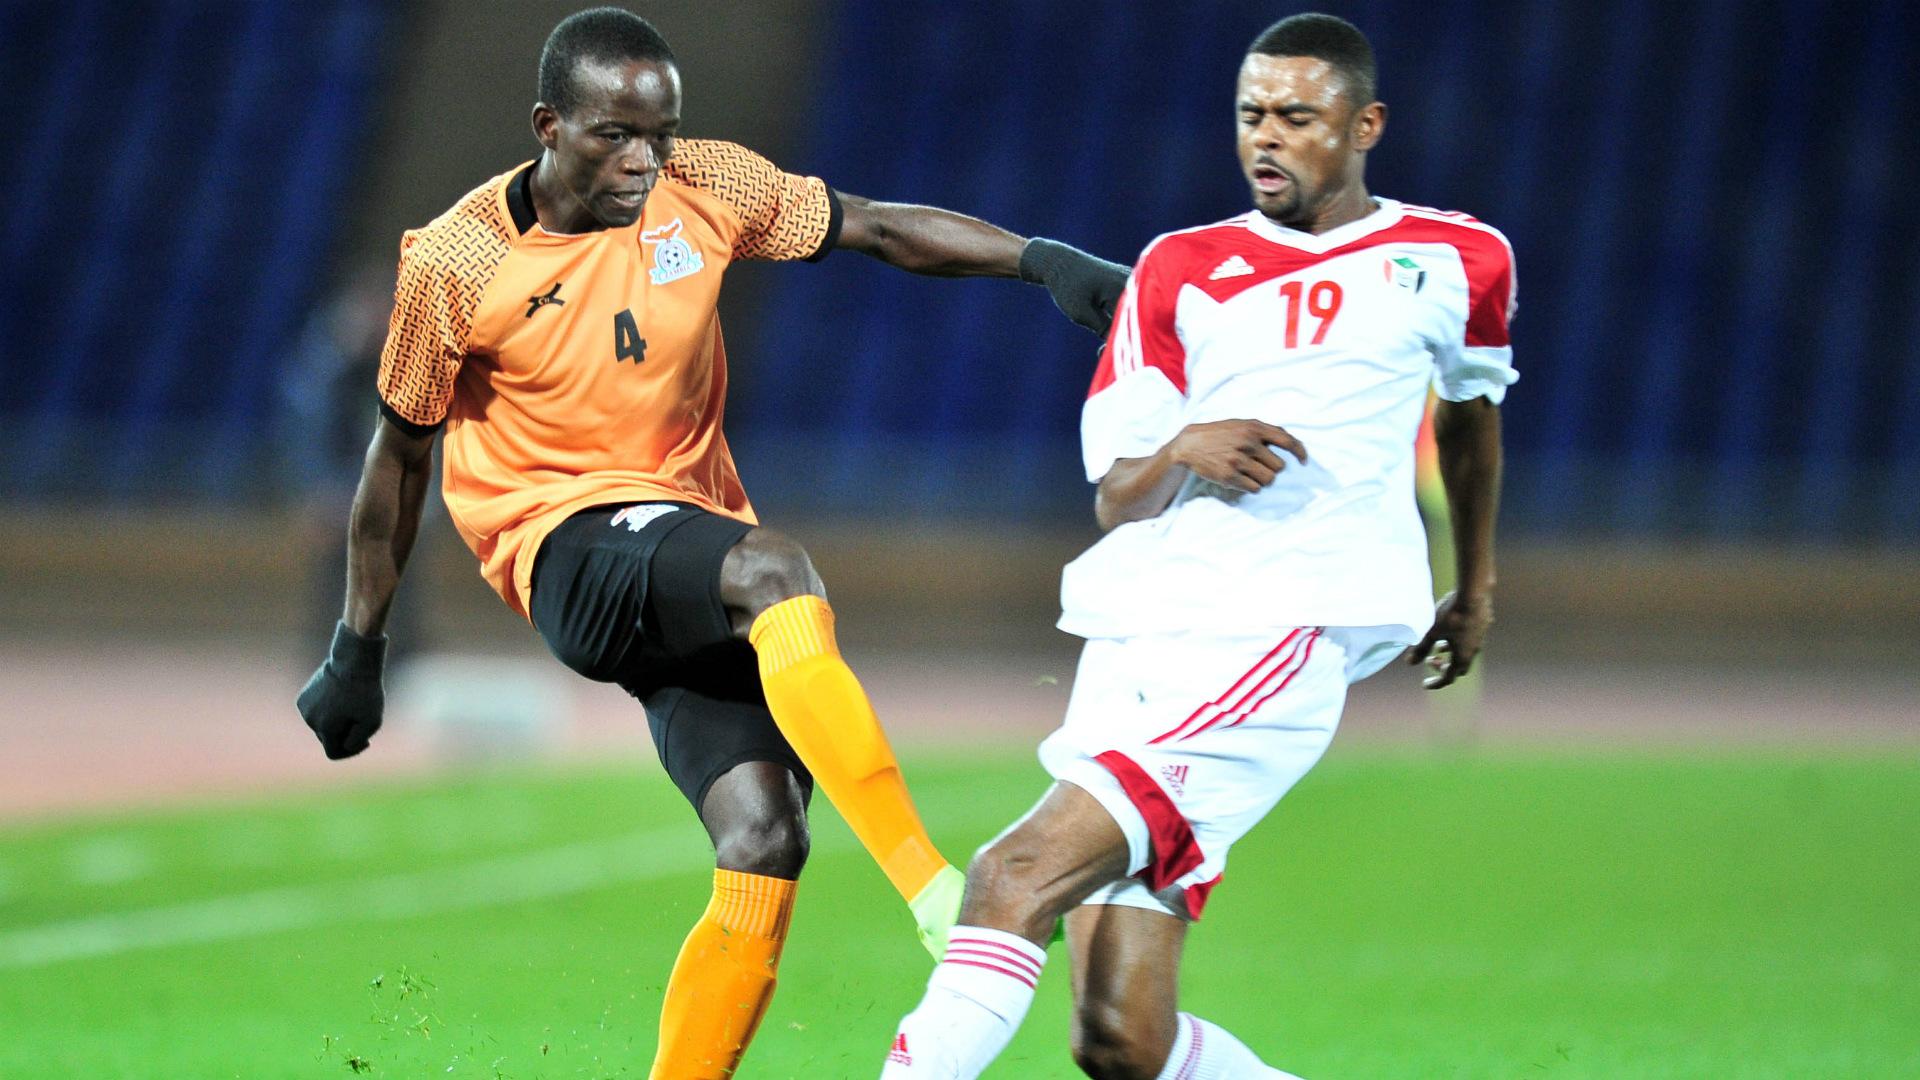 CHAN 2018: CECAFA region country Sudan outwits Zambia to reach semi finals